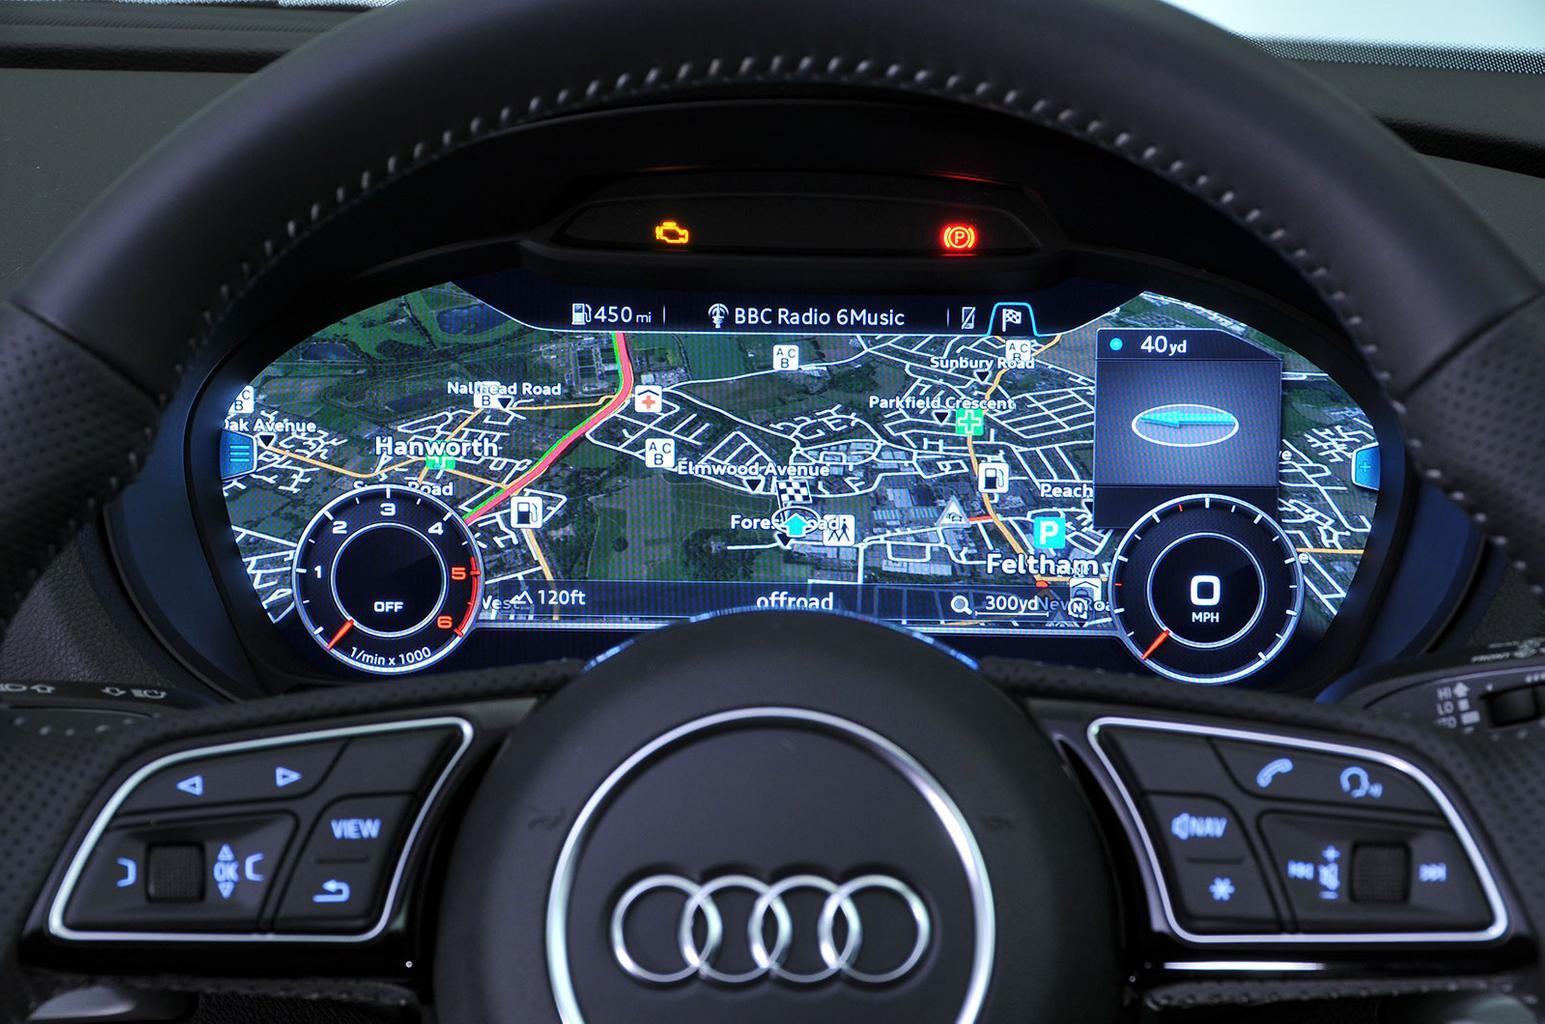 Audi Virtual Cockpit (£450)